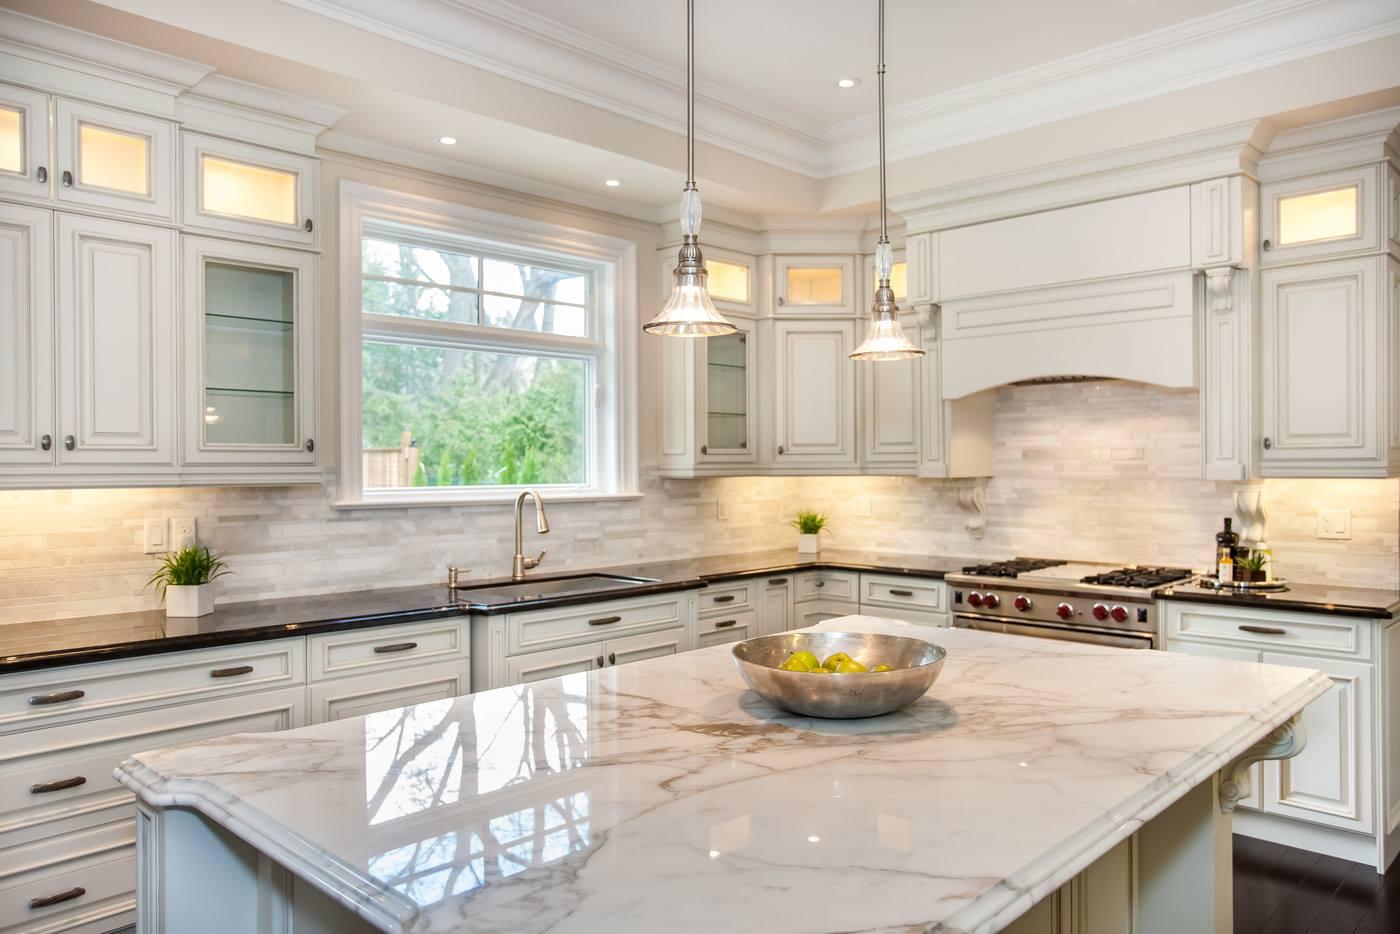 Laurentide Kitchen Cabinets | London Ontario | Warehouse Guys